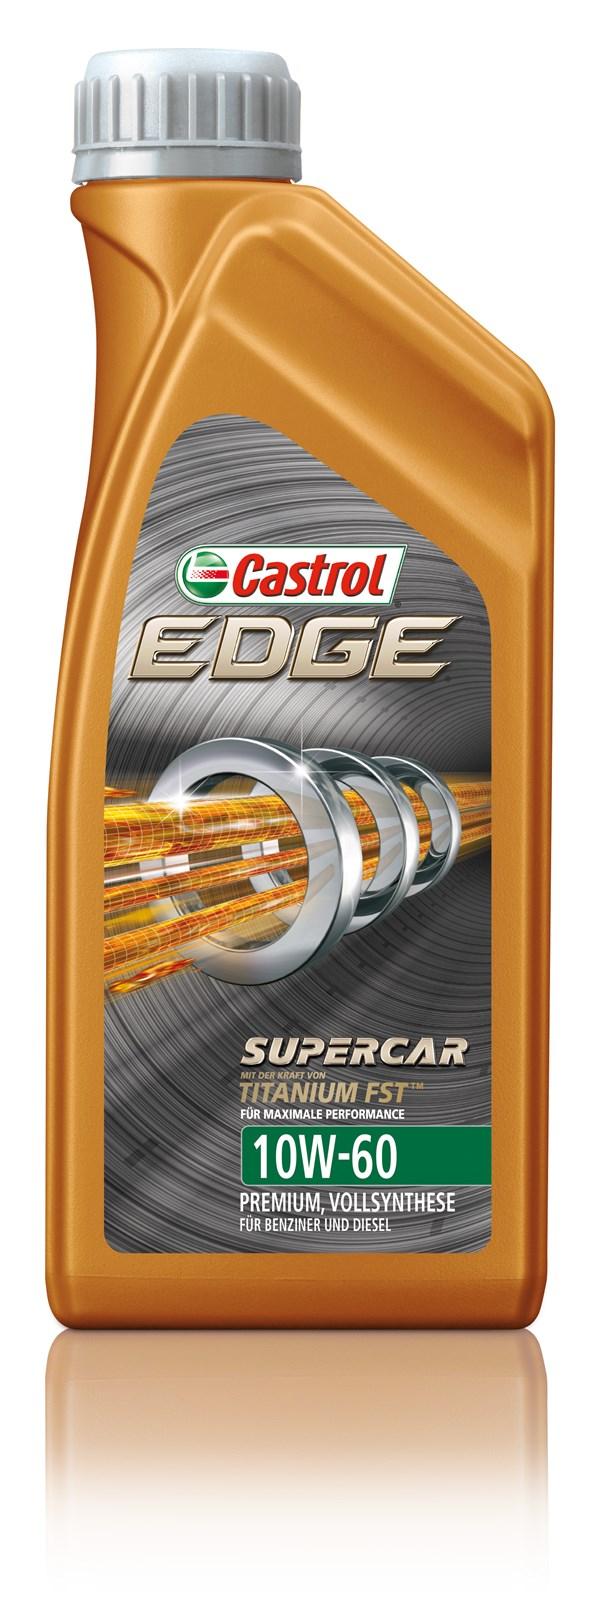 castrol edge titanium fst supercar 10w60 motorolie fuldsyntetisk castrol edge titanium. Black Bedroom Furniture Sets. Home Design Ideas